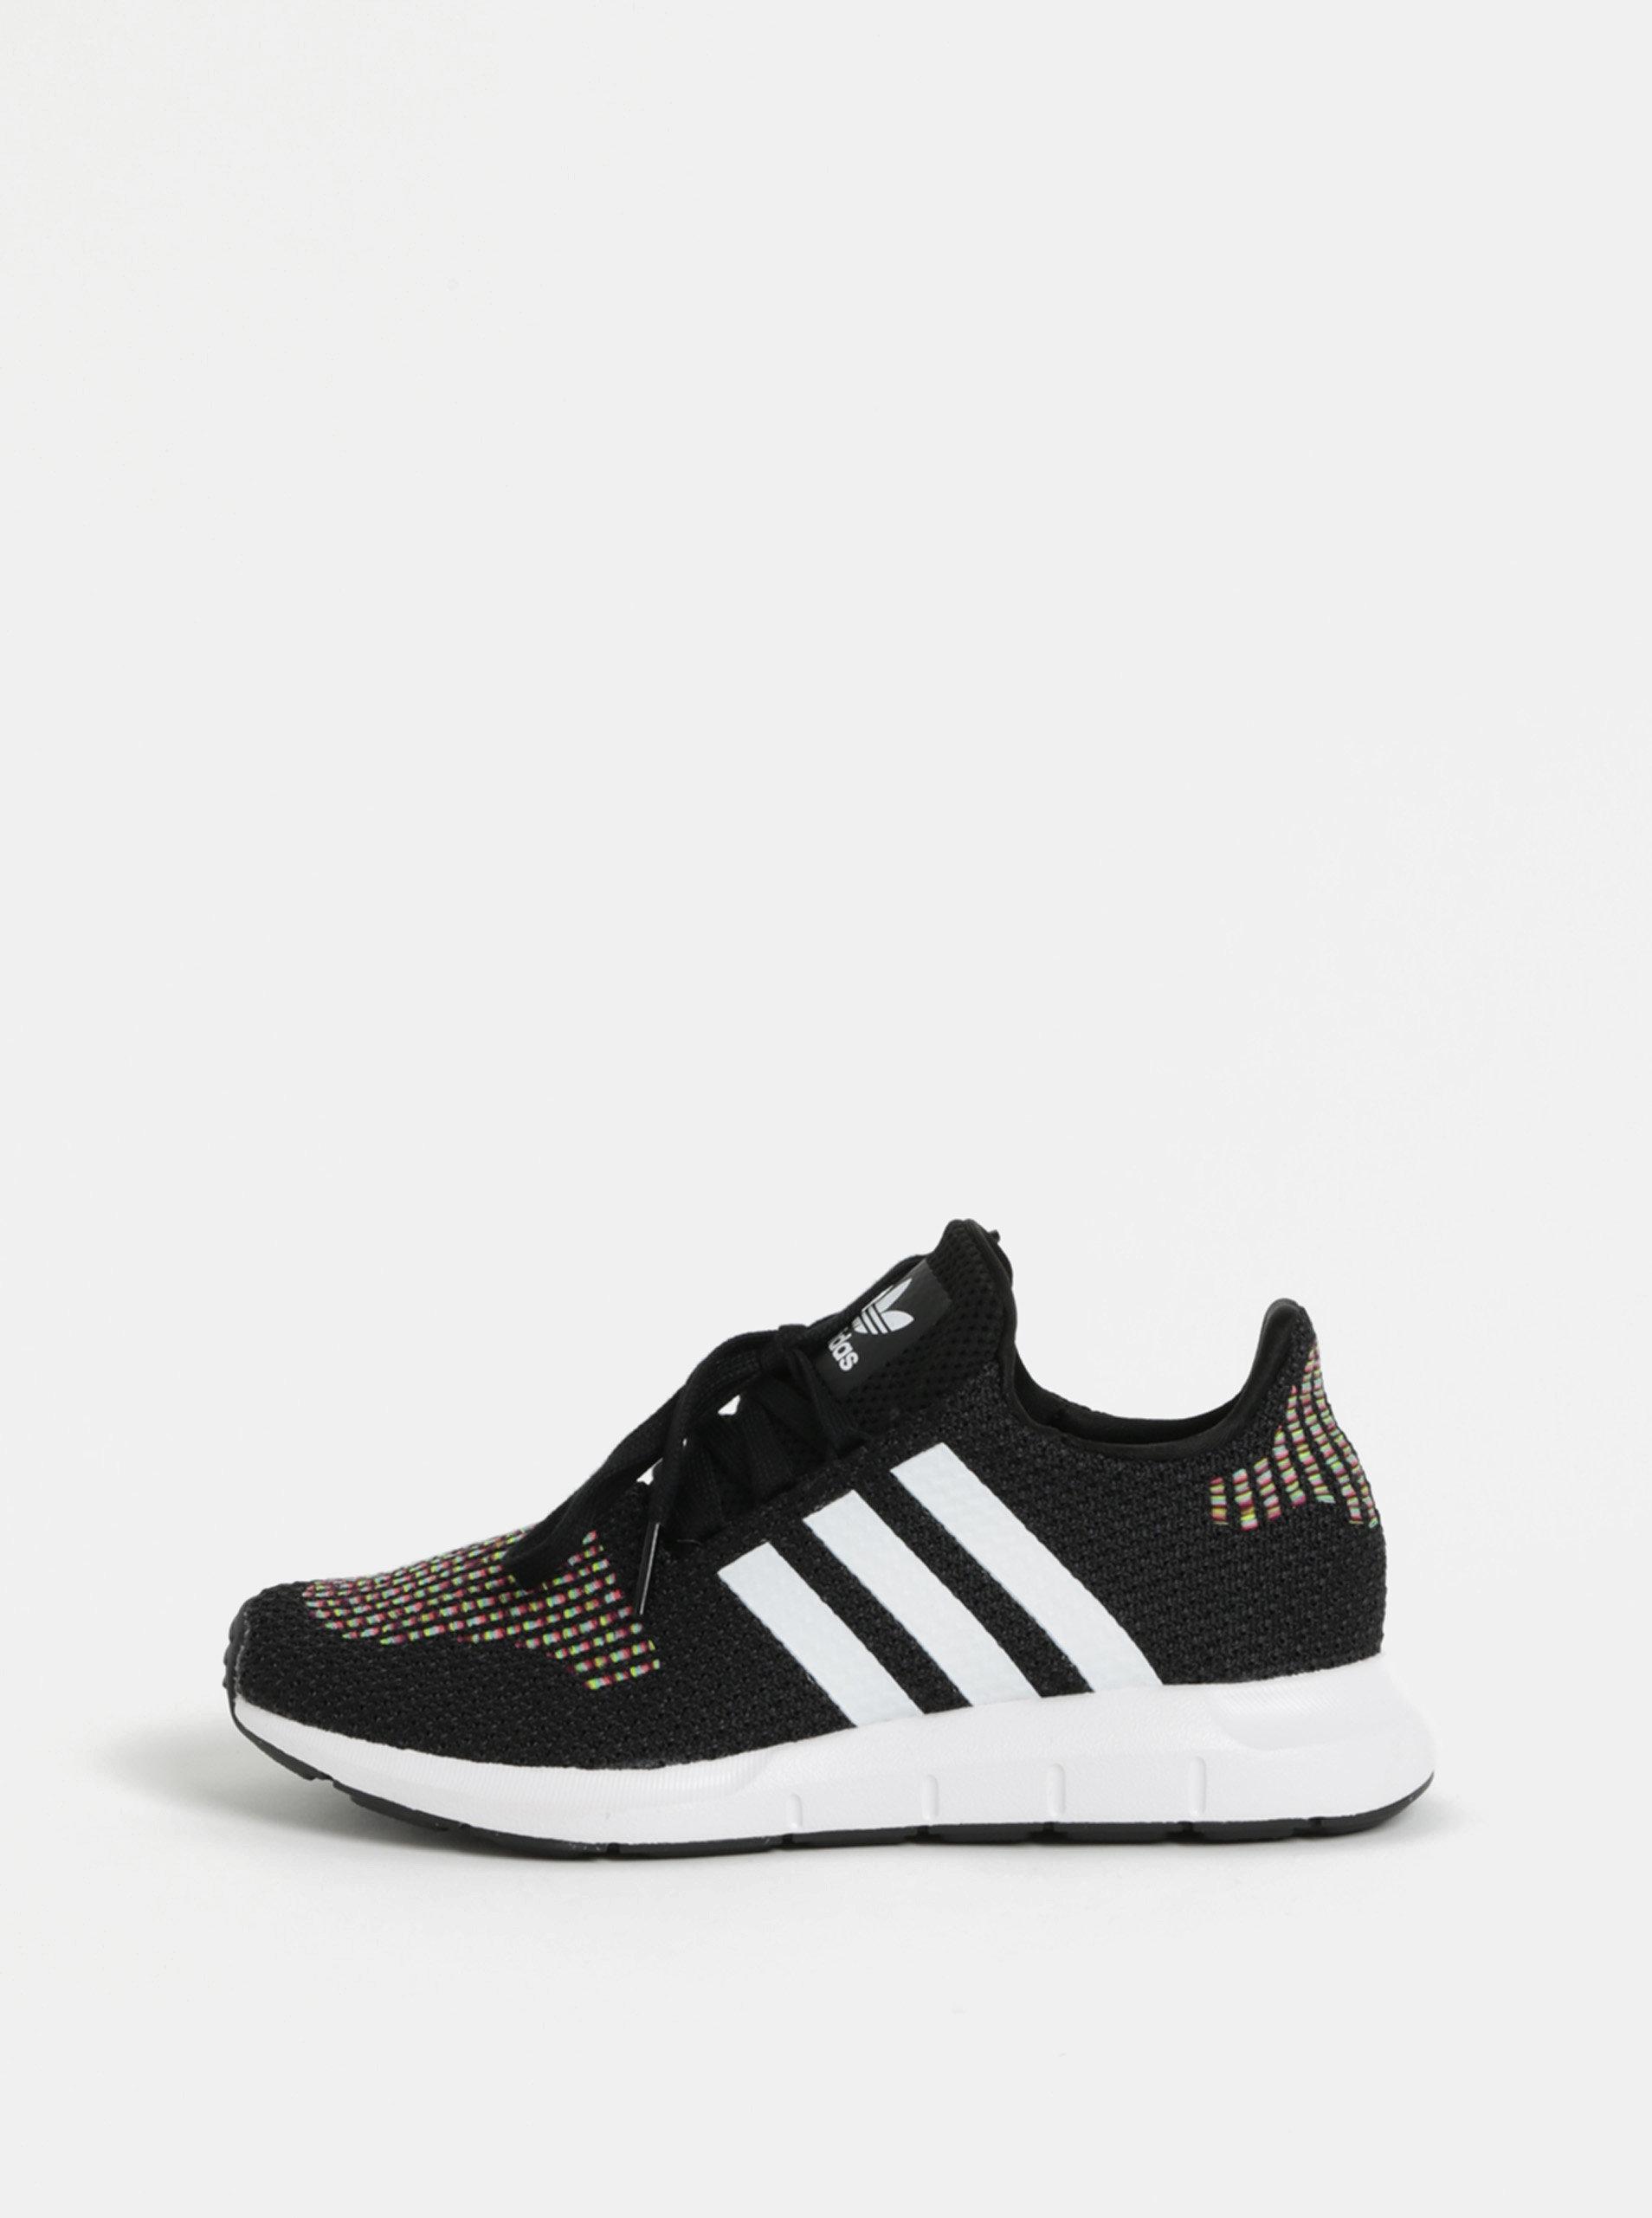 7bb67ed08bb45 Čierne dámske tenisky adidas Originals Swift Run | ZOOT.sk